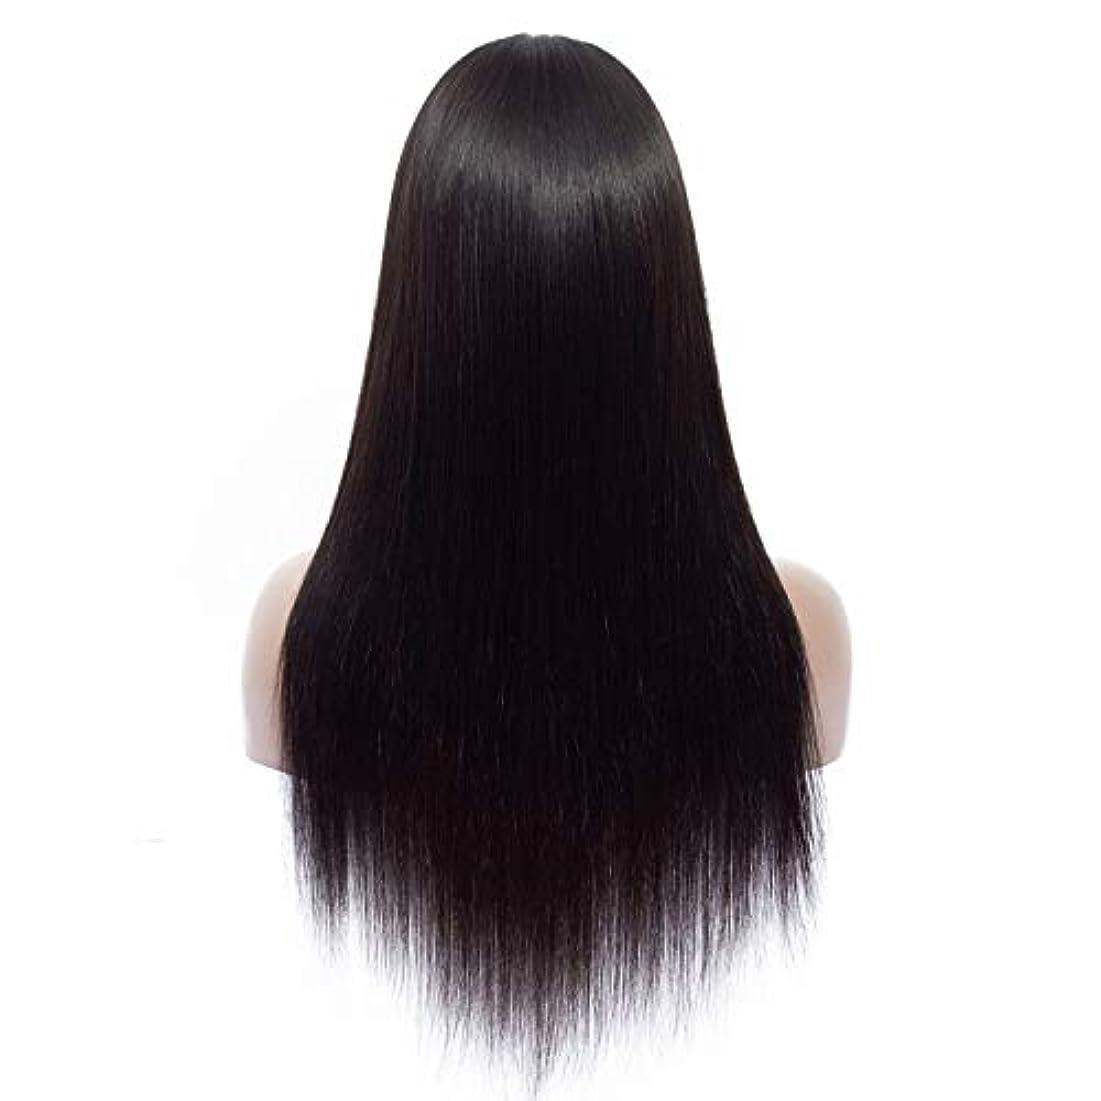 SRY-Wigファッション ヨーロッパとアメリカの黒の長い髪耐熱ストレートコスプレかつらコスプレ合成髪ウィッグ (Color : ブラック, Size : 16inch)